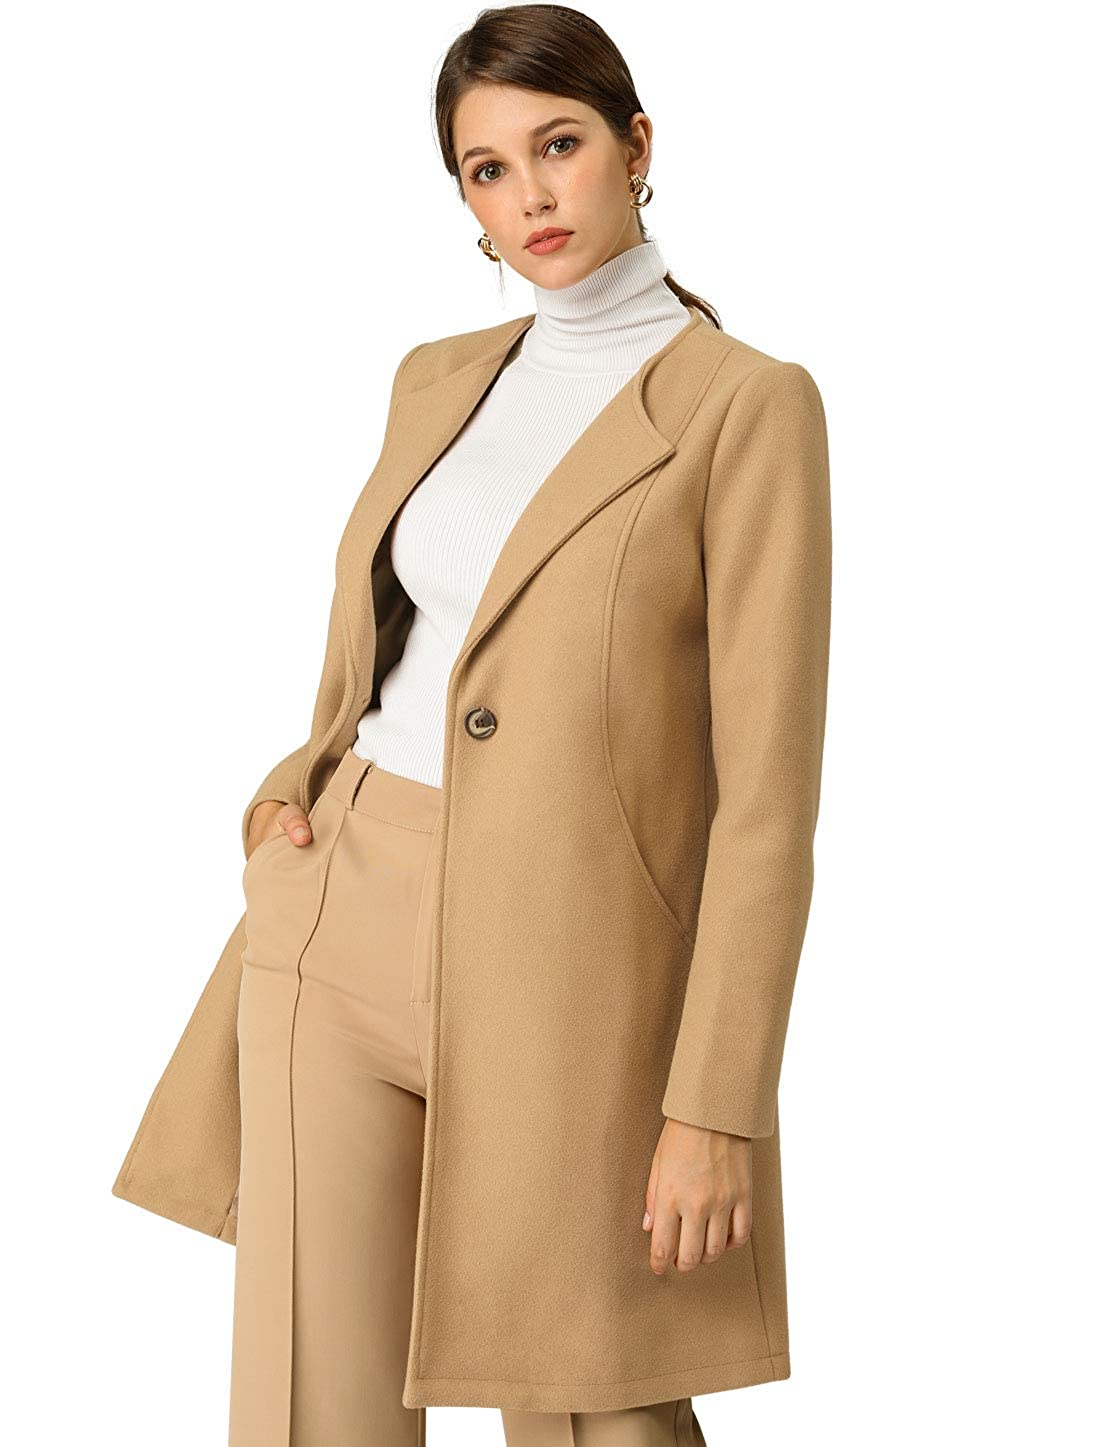 Allegra K Women's Mid-Length Collarless Minimalist Business Coat